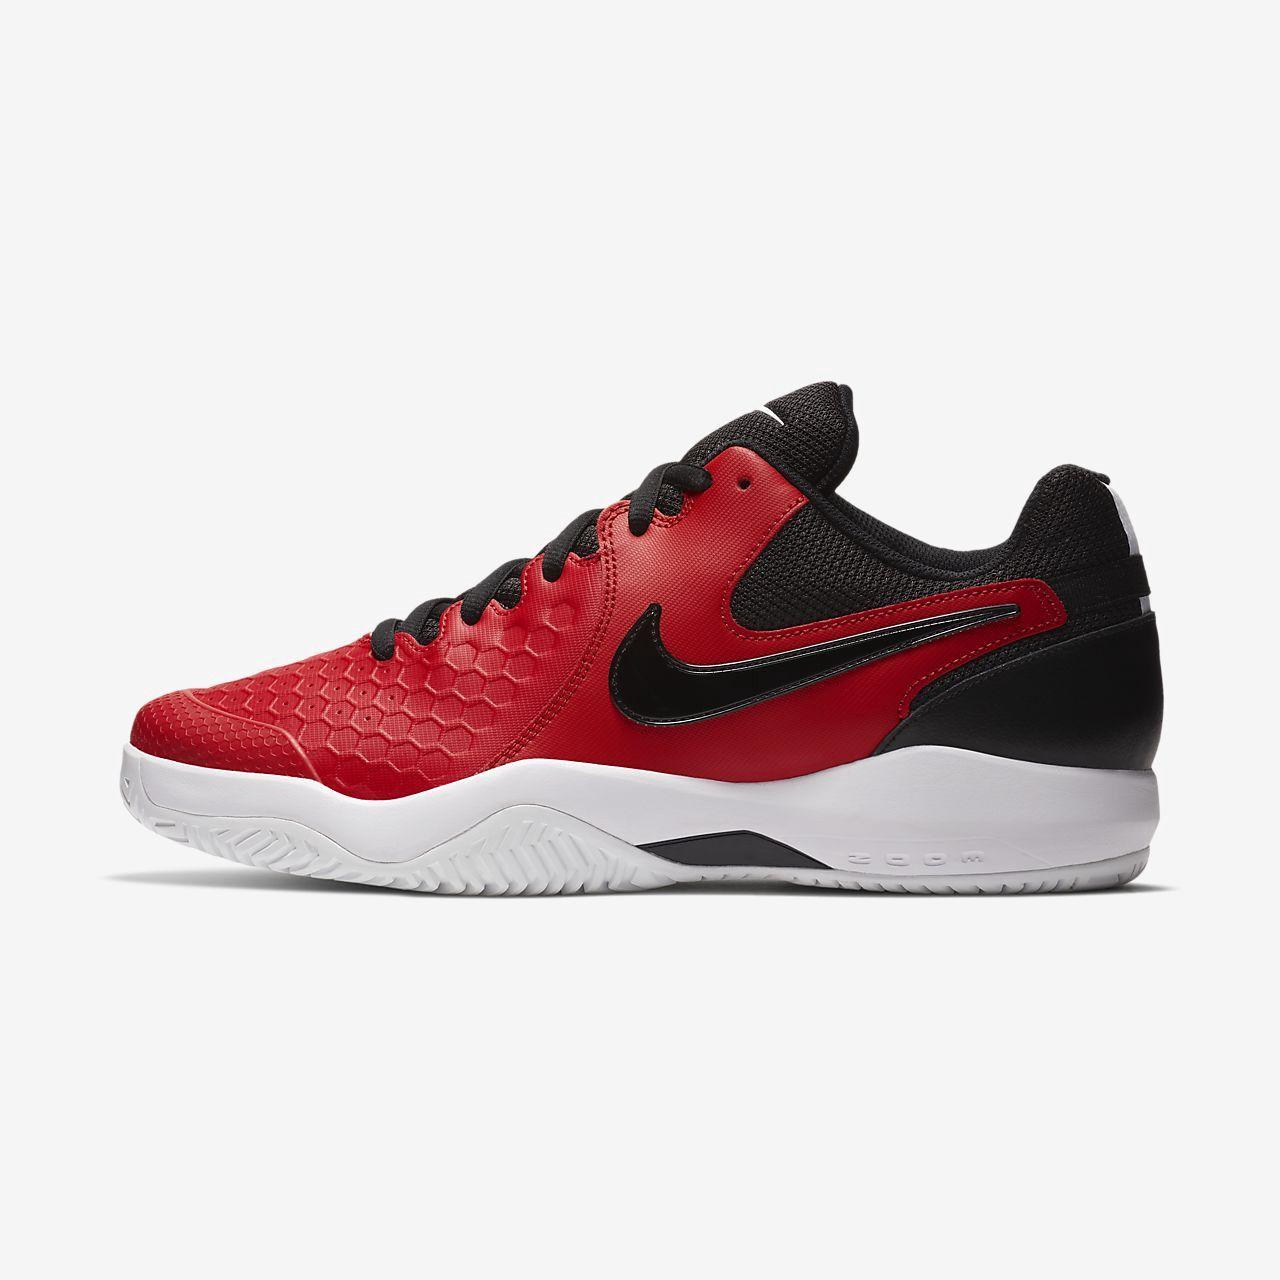 wholesale dealer f4f80 67649 NIKE NikeCourt Air Zoom Resistance Mens Tennis Shoe. nike shoes